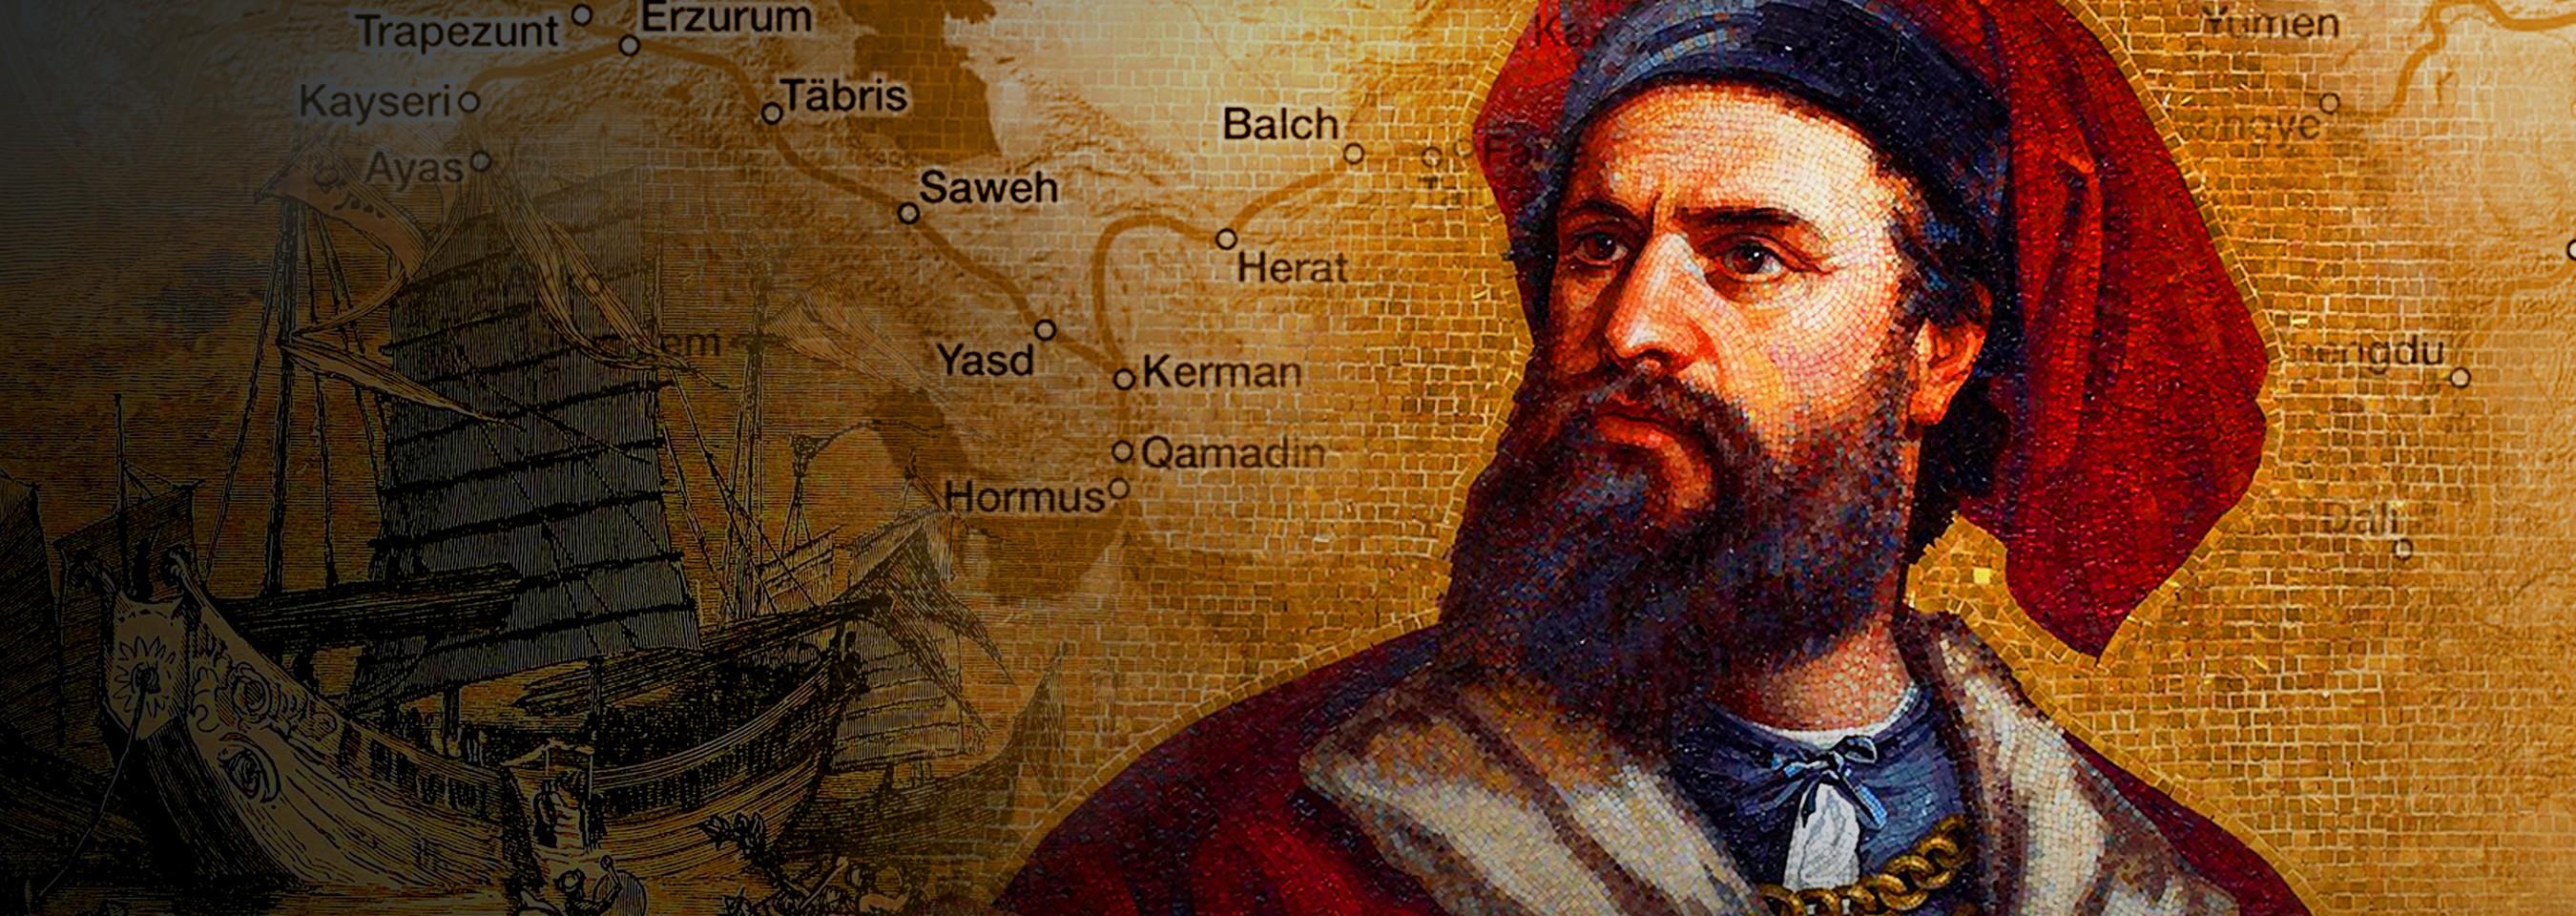 Secret File of Marco Polo